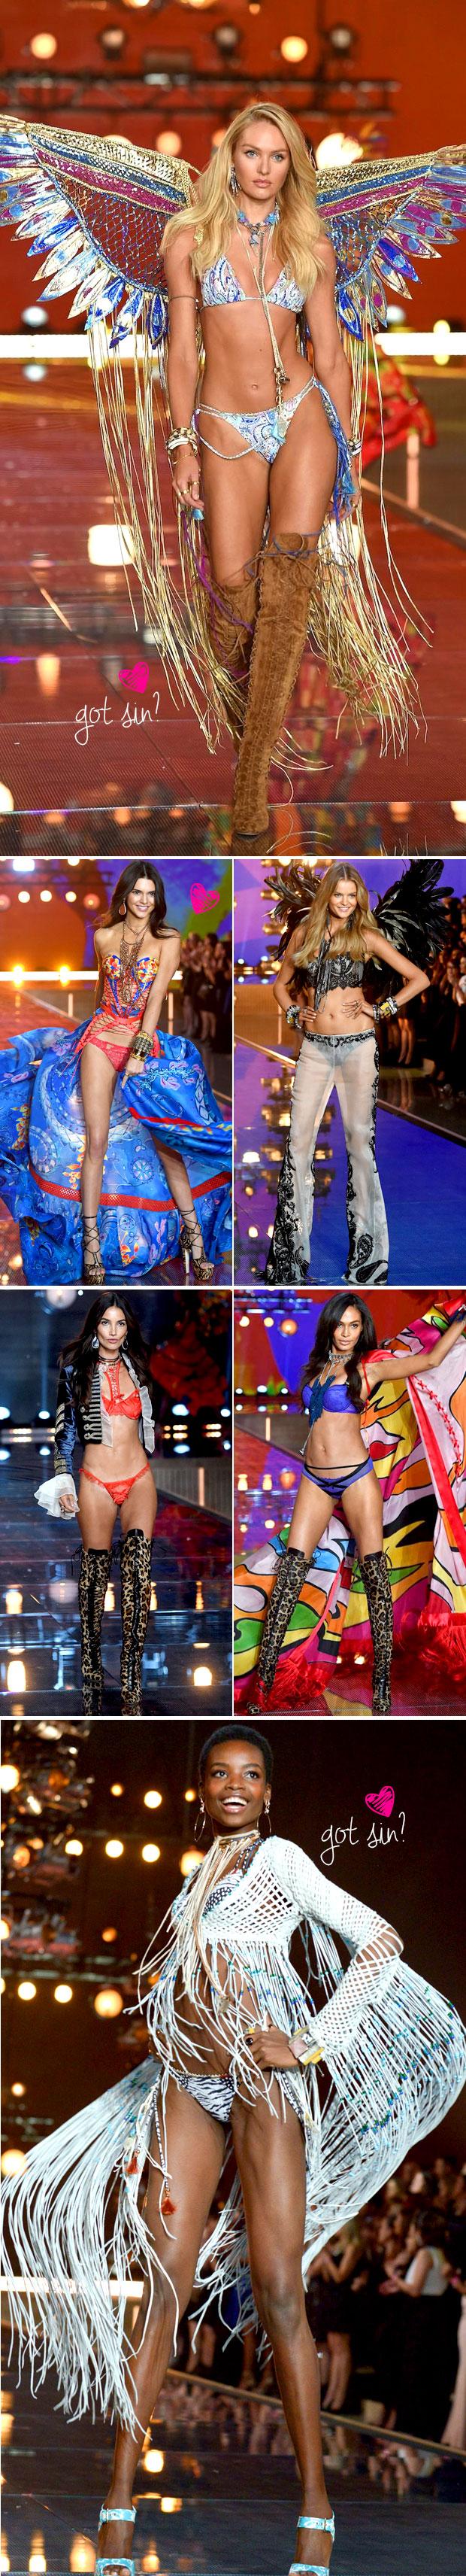 victorias-secret-fashion-show-todas-as-fotos-blog-got-sin-60s-boho-angels-candice-swanepoel-lily-aldridge-maria-borges-kendall-jenner